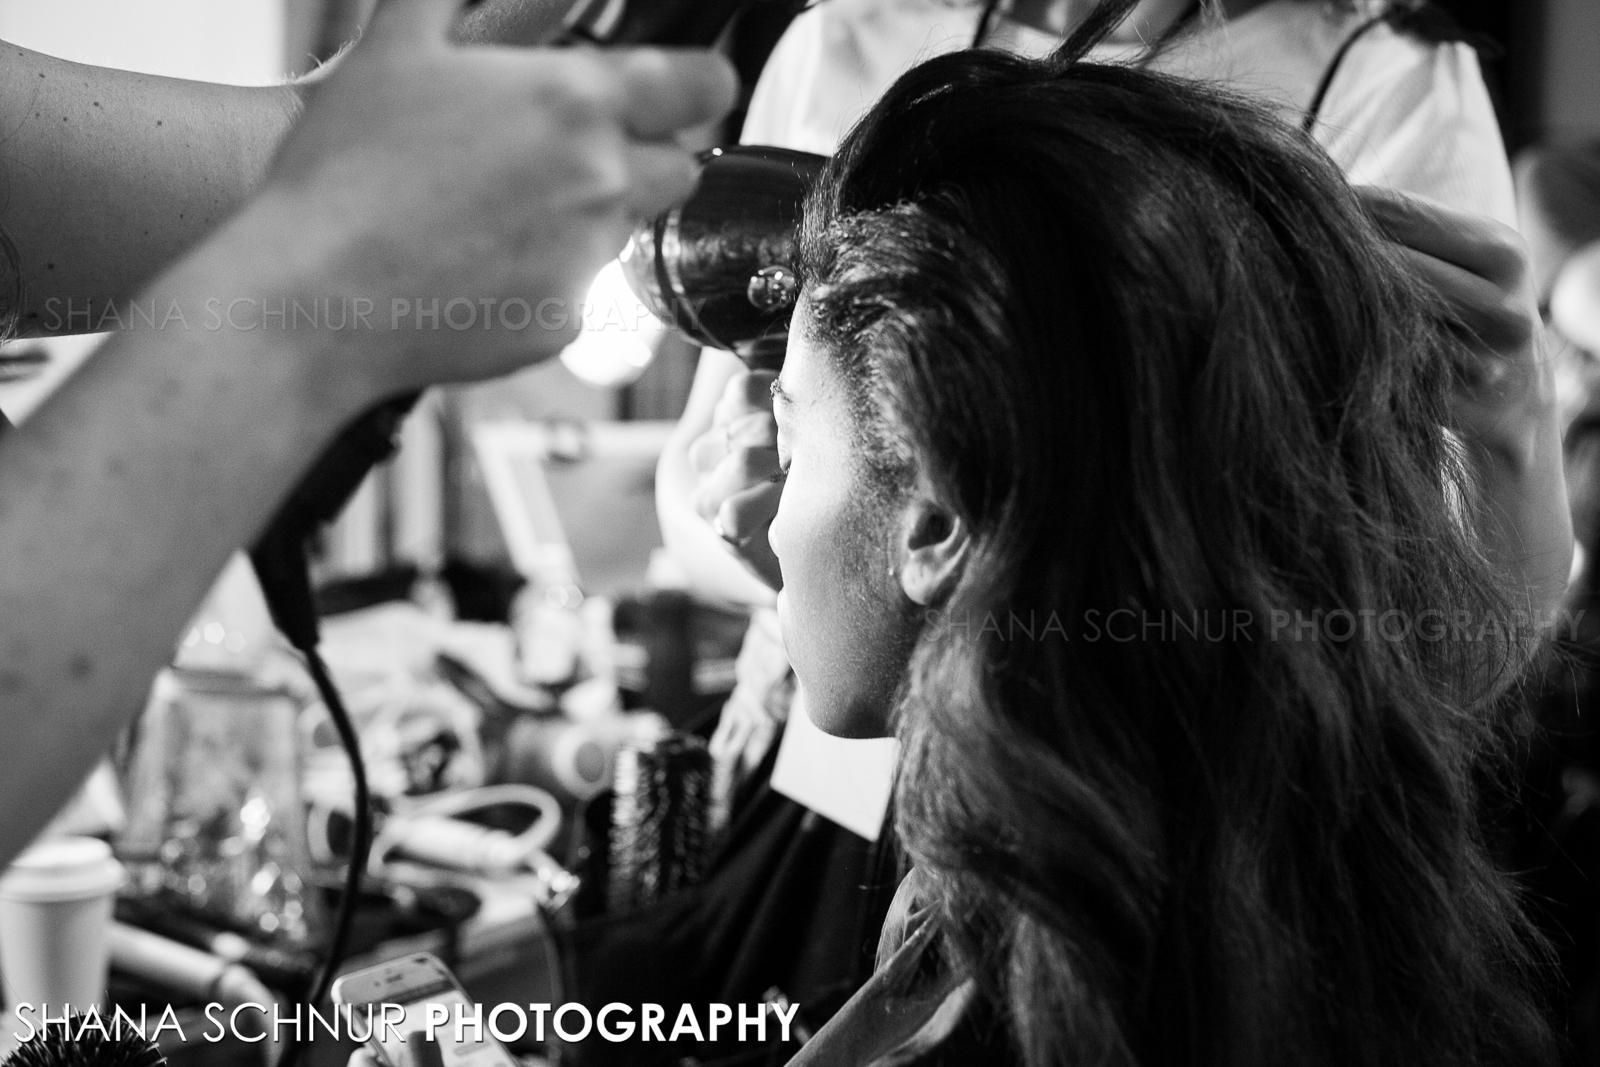 JMendel-Shana-Schnur-Photography--017.jpg